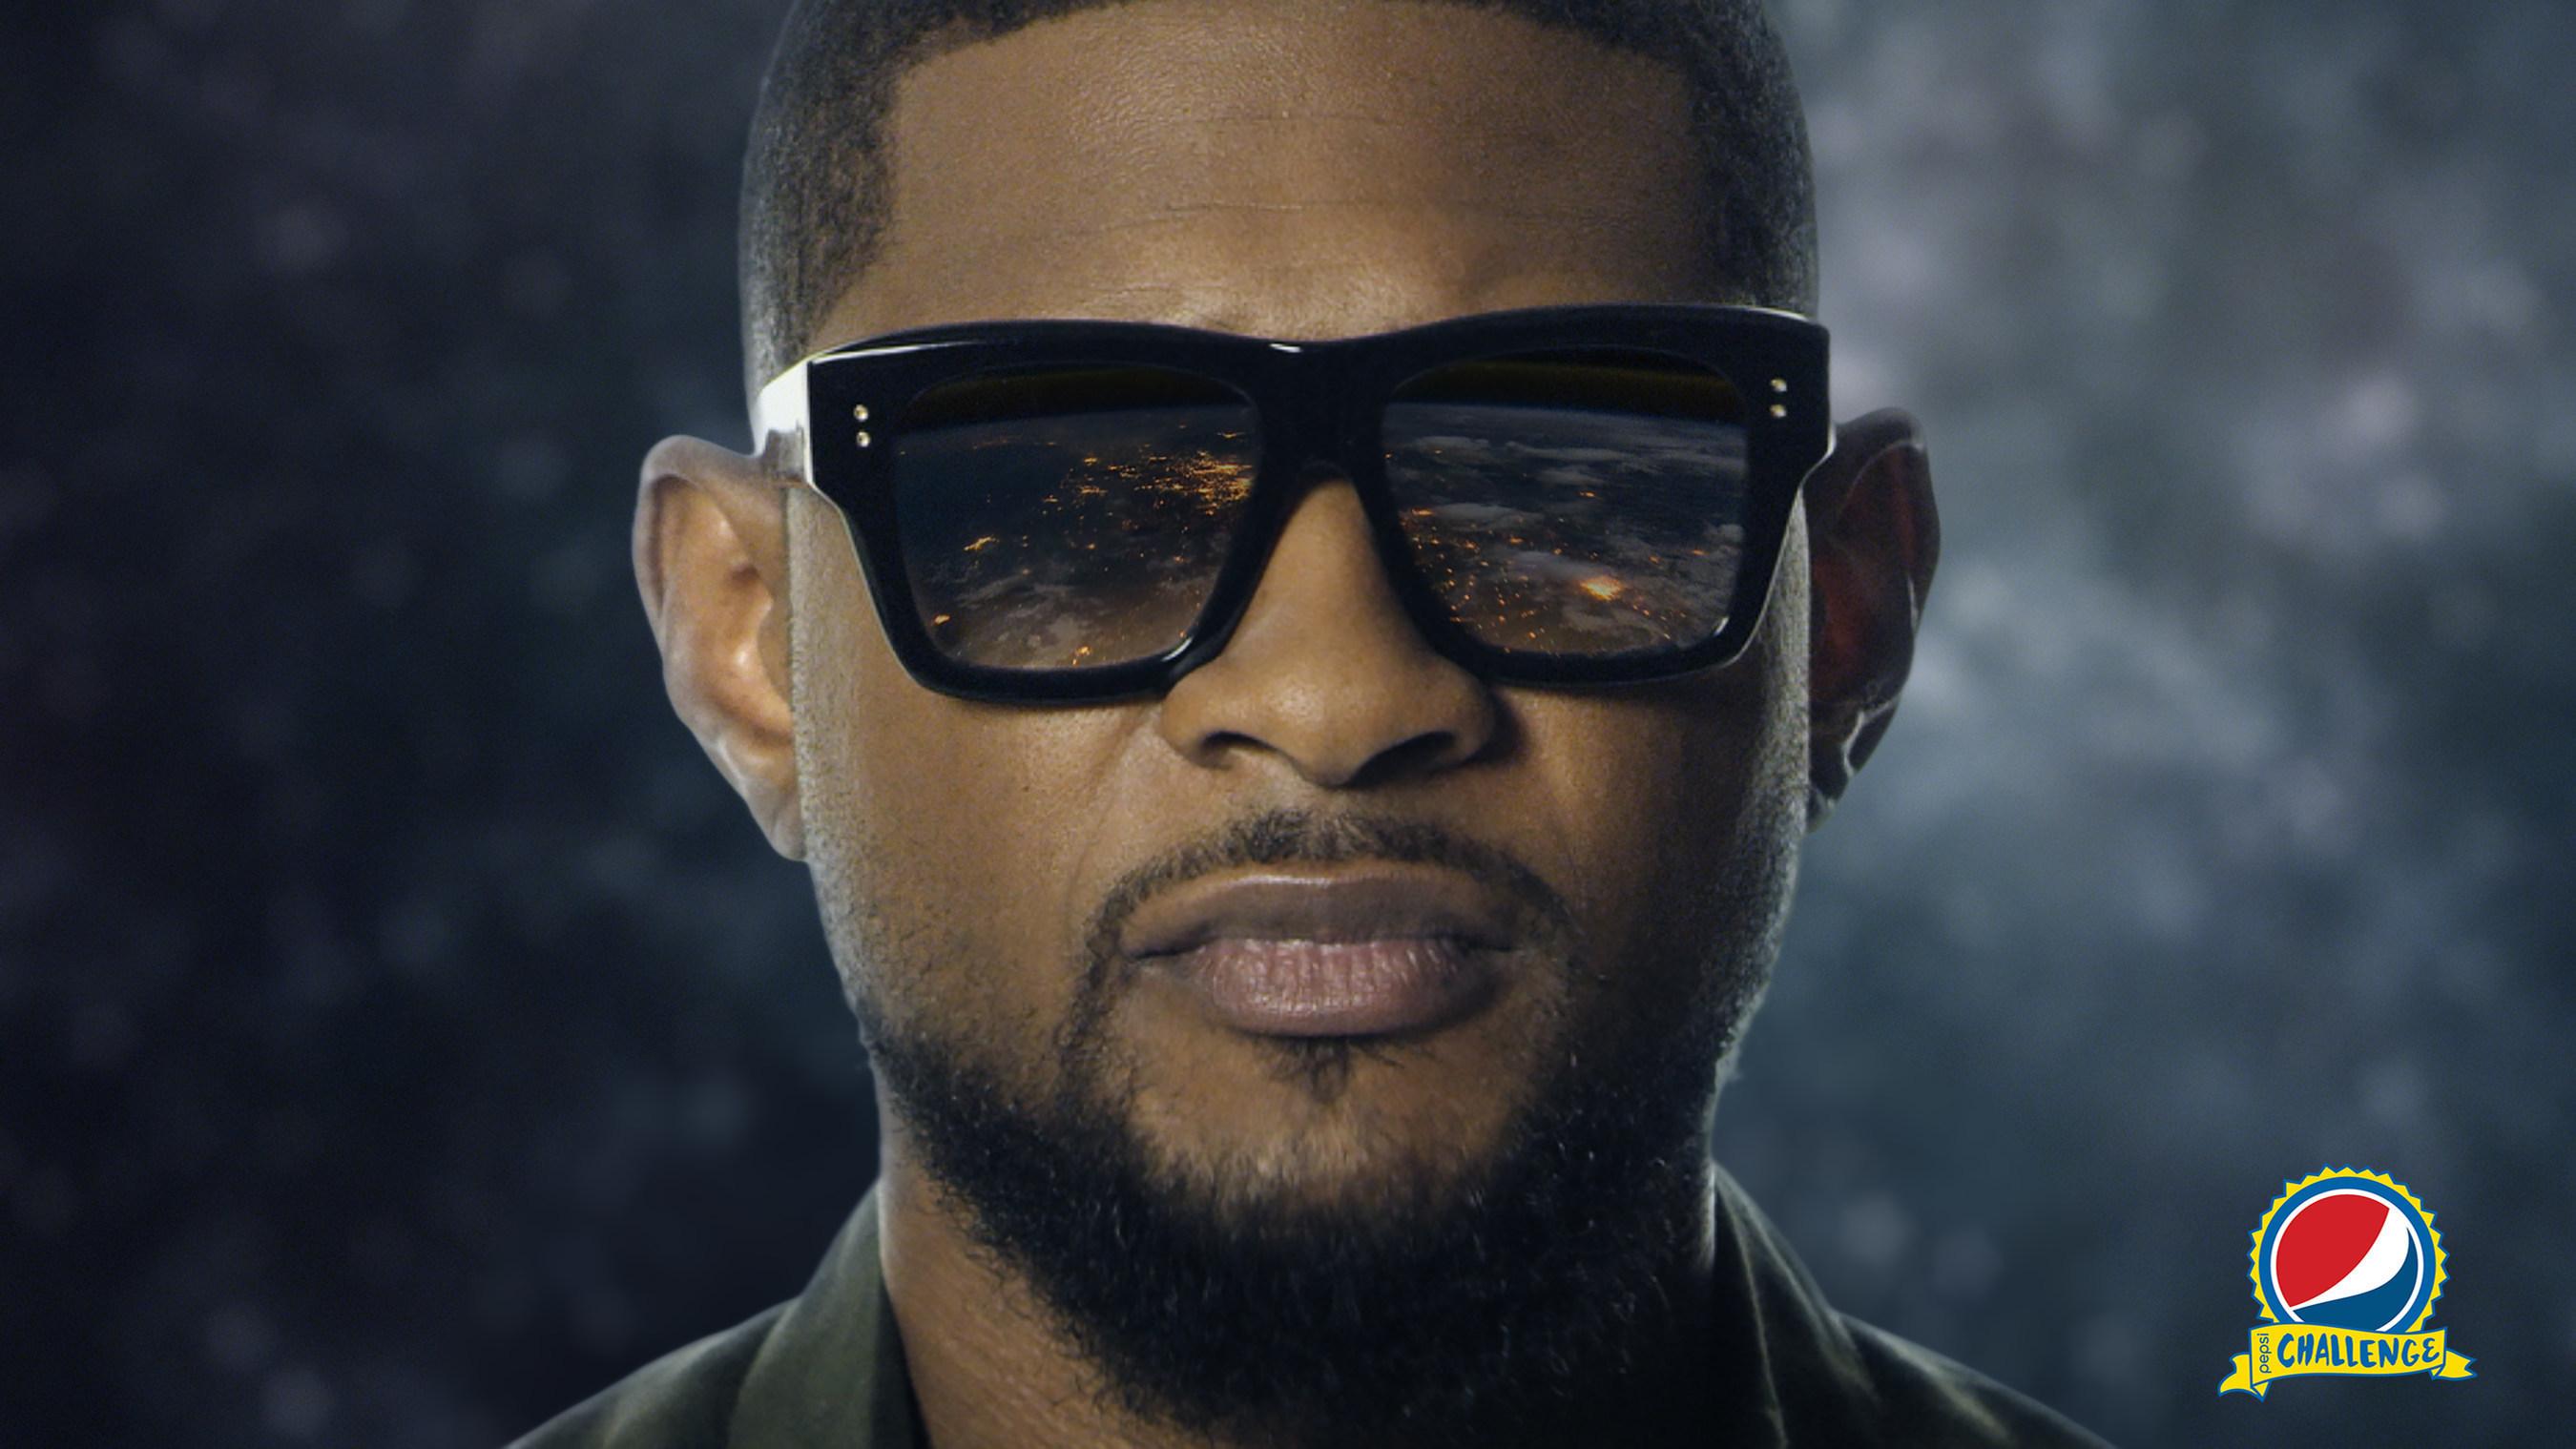 Pepsi®, Usher и UrtheCast совместно реализуют грандиозный кинопроект